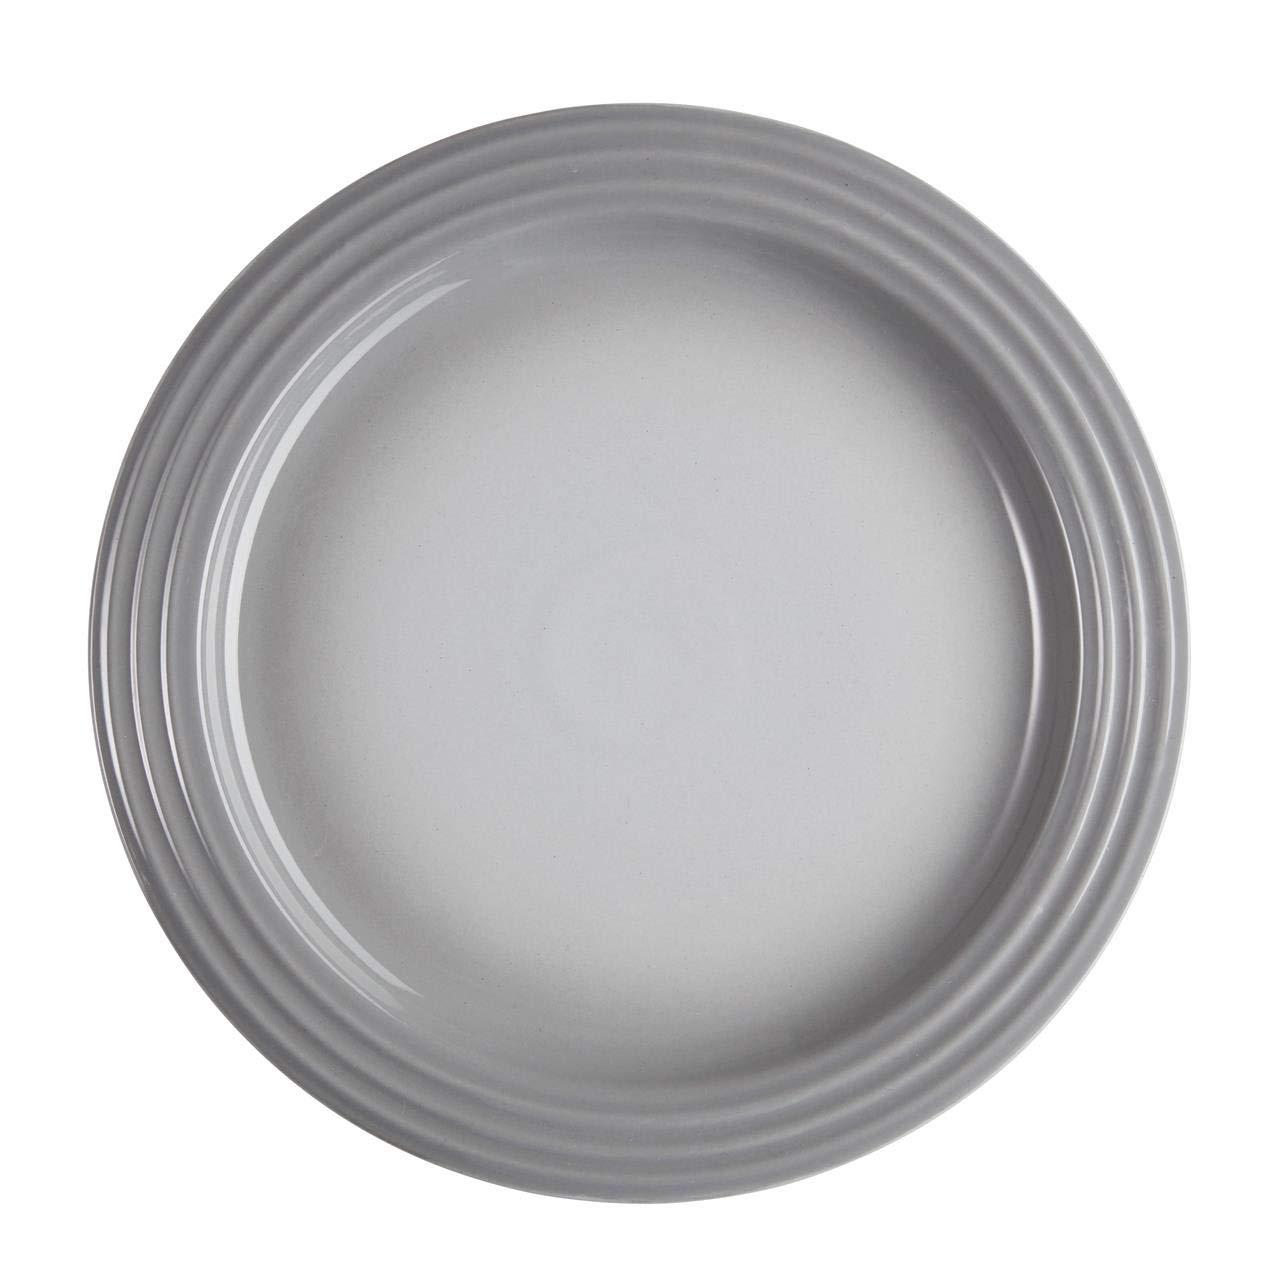 Le Creuset Plato Cerámico, Mist Grey, 27 cm: Amazon.es: Hogar